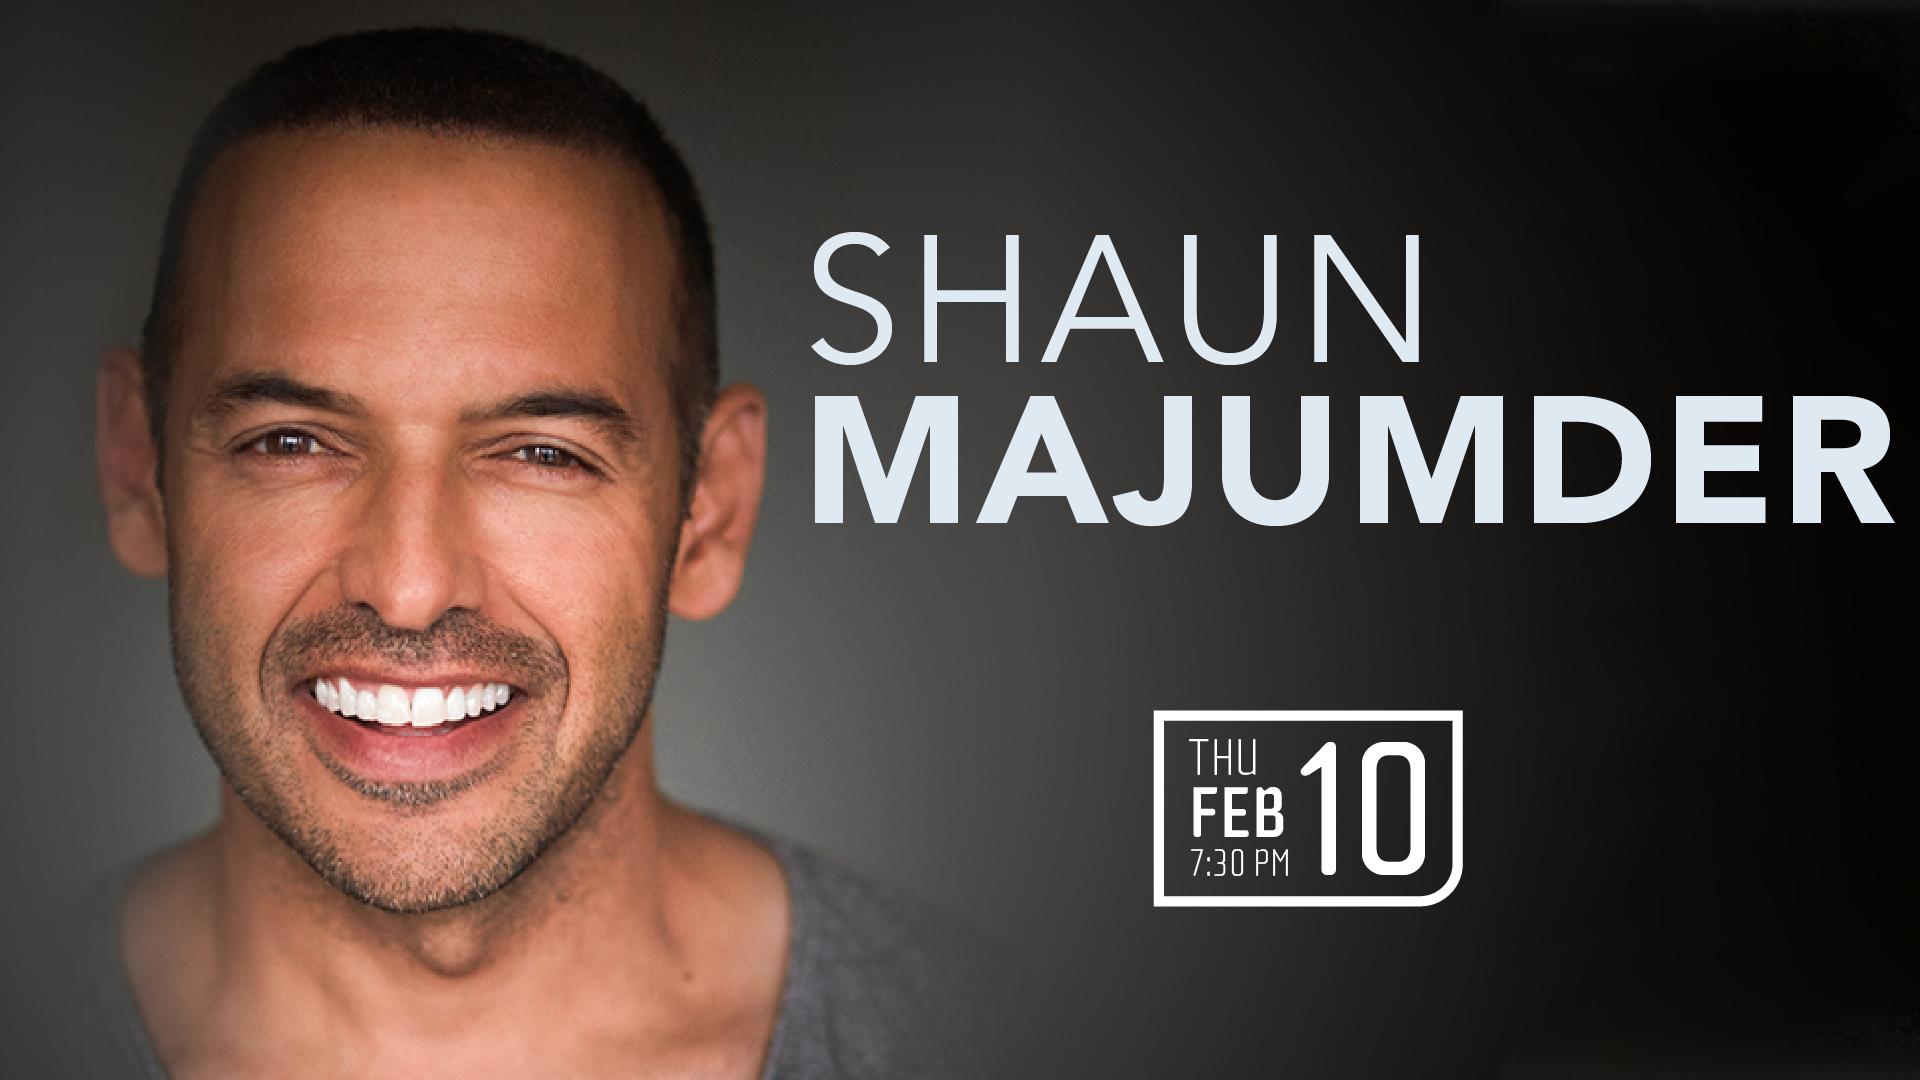 Shaun Majumder